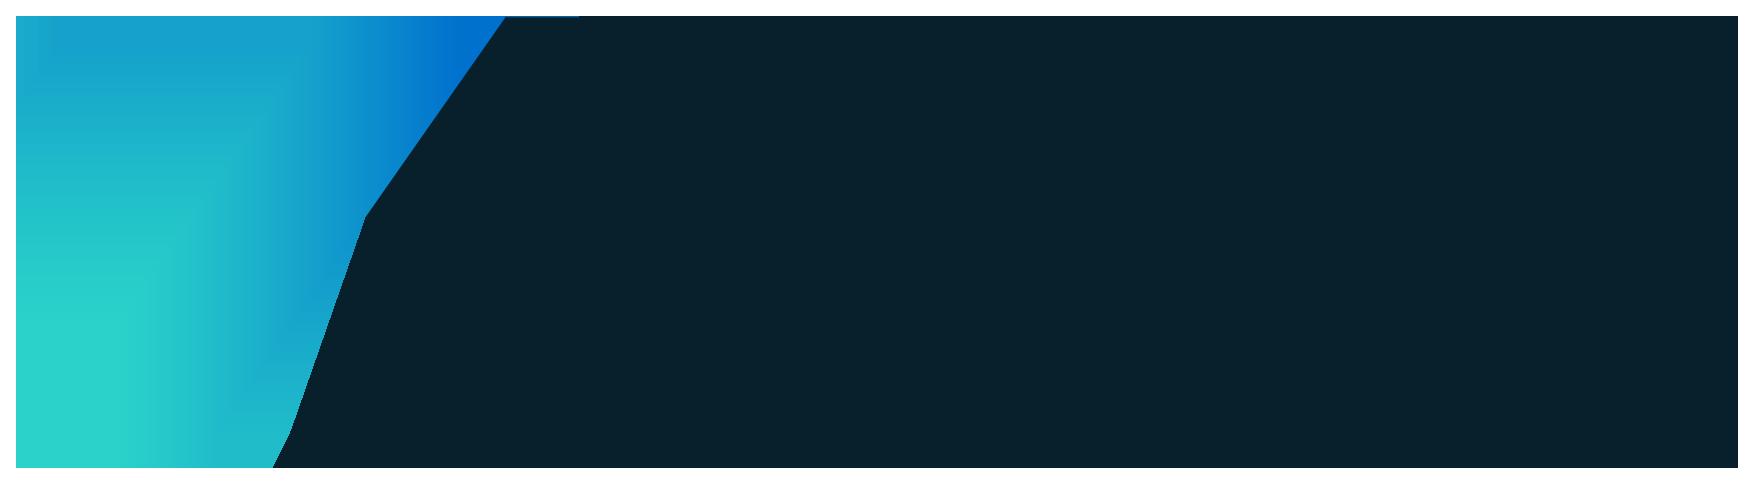 Fitness Australia